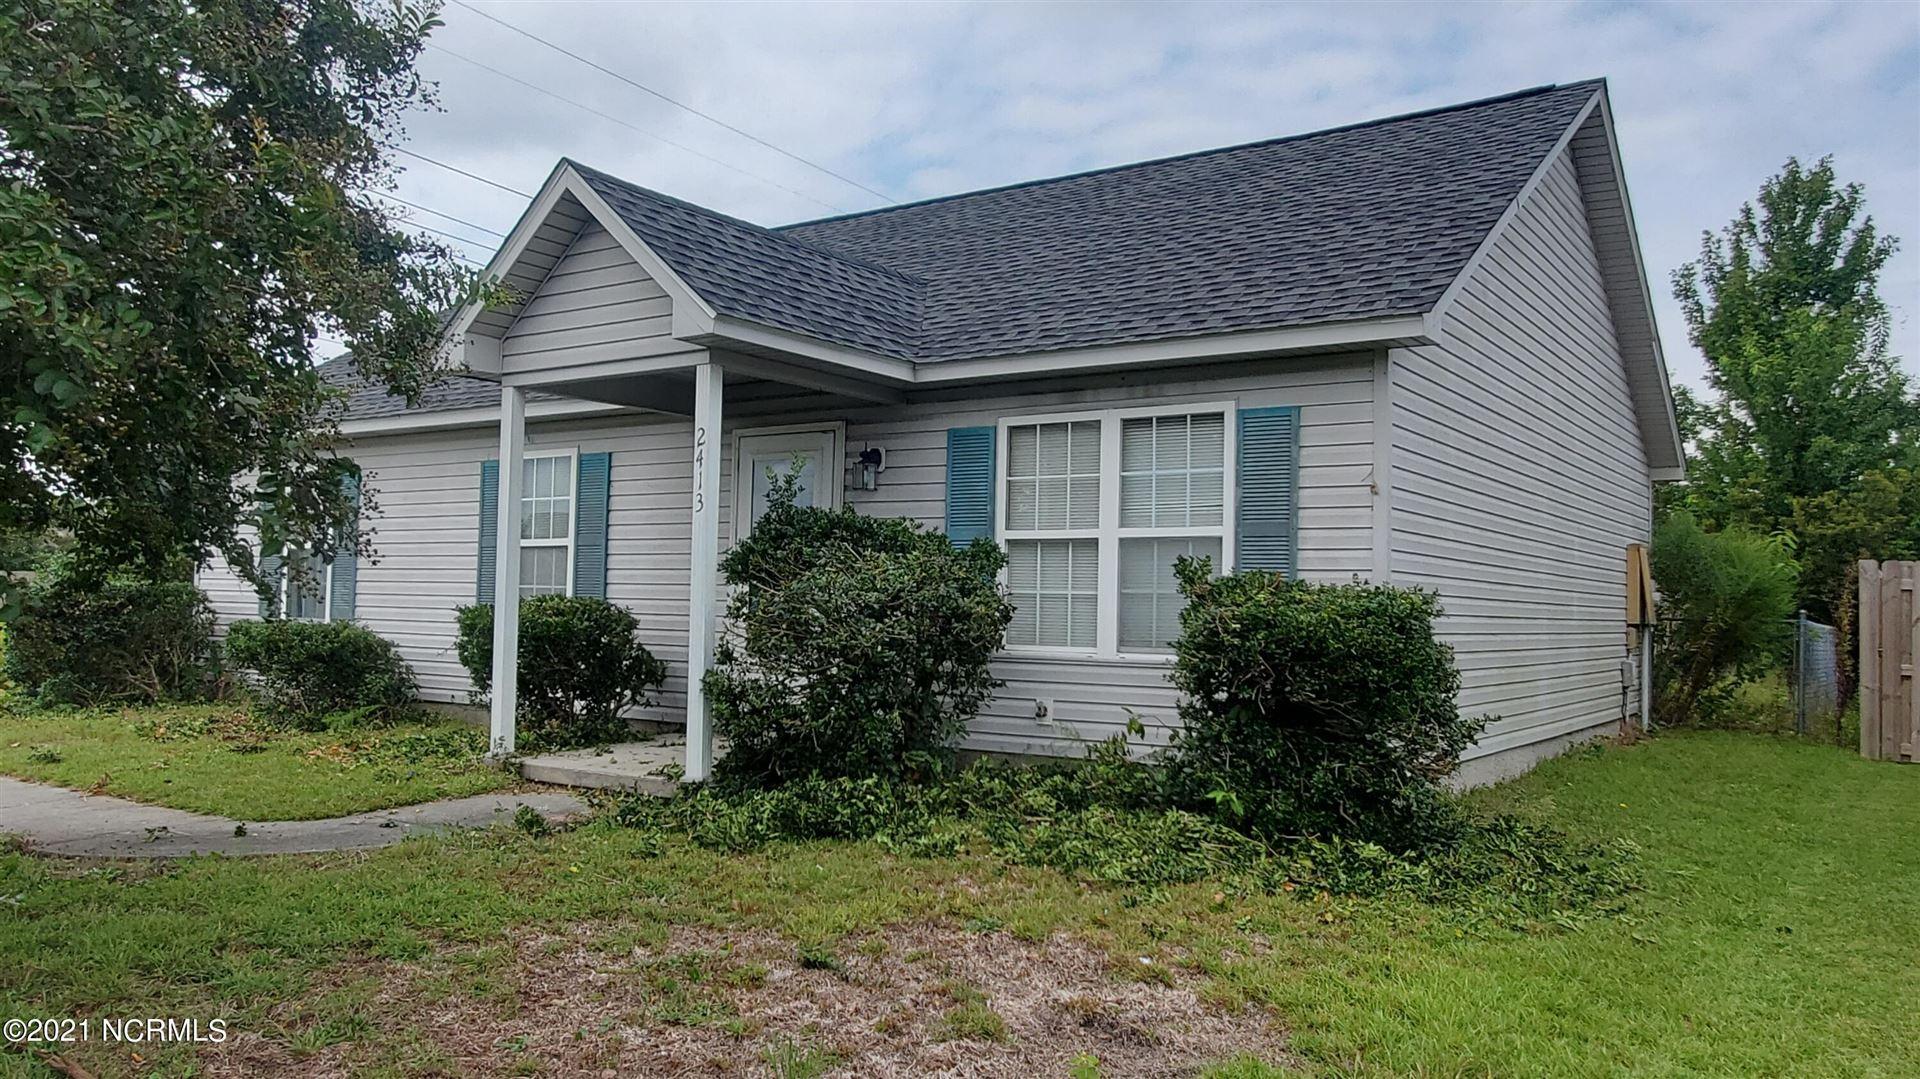 Photo of 2413 White Road, Wilmington, NC 28411 (MLS # 100289868)